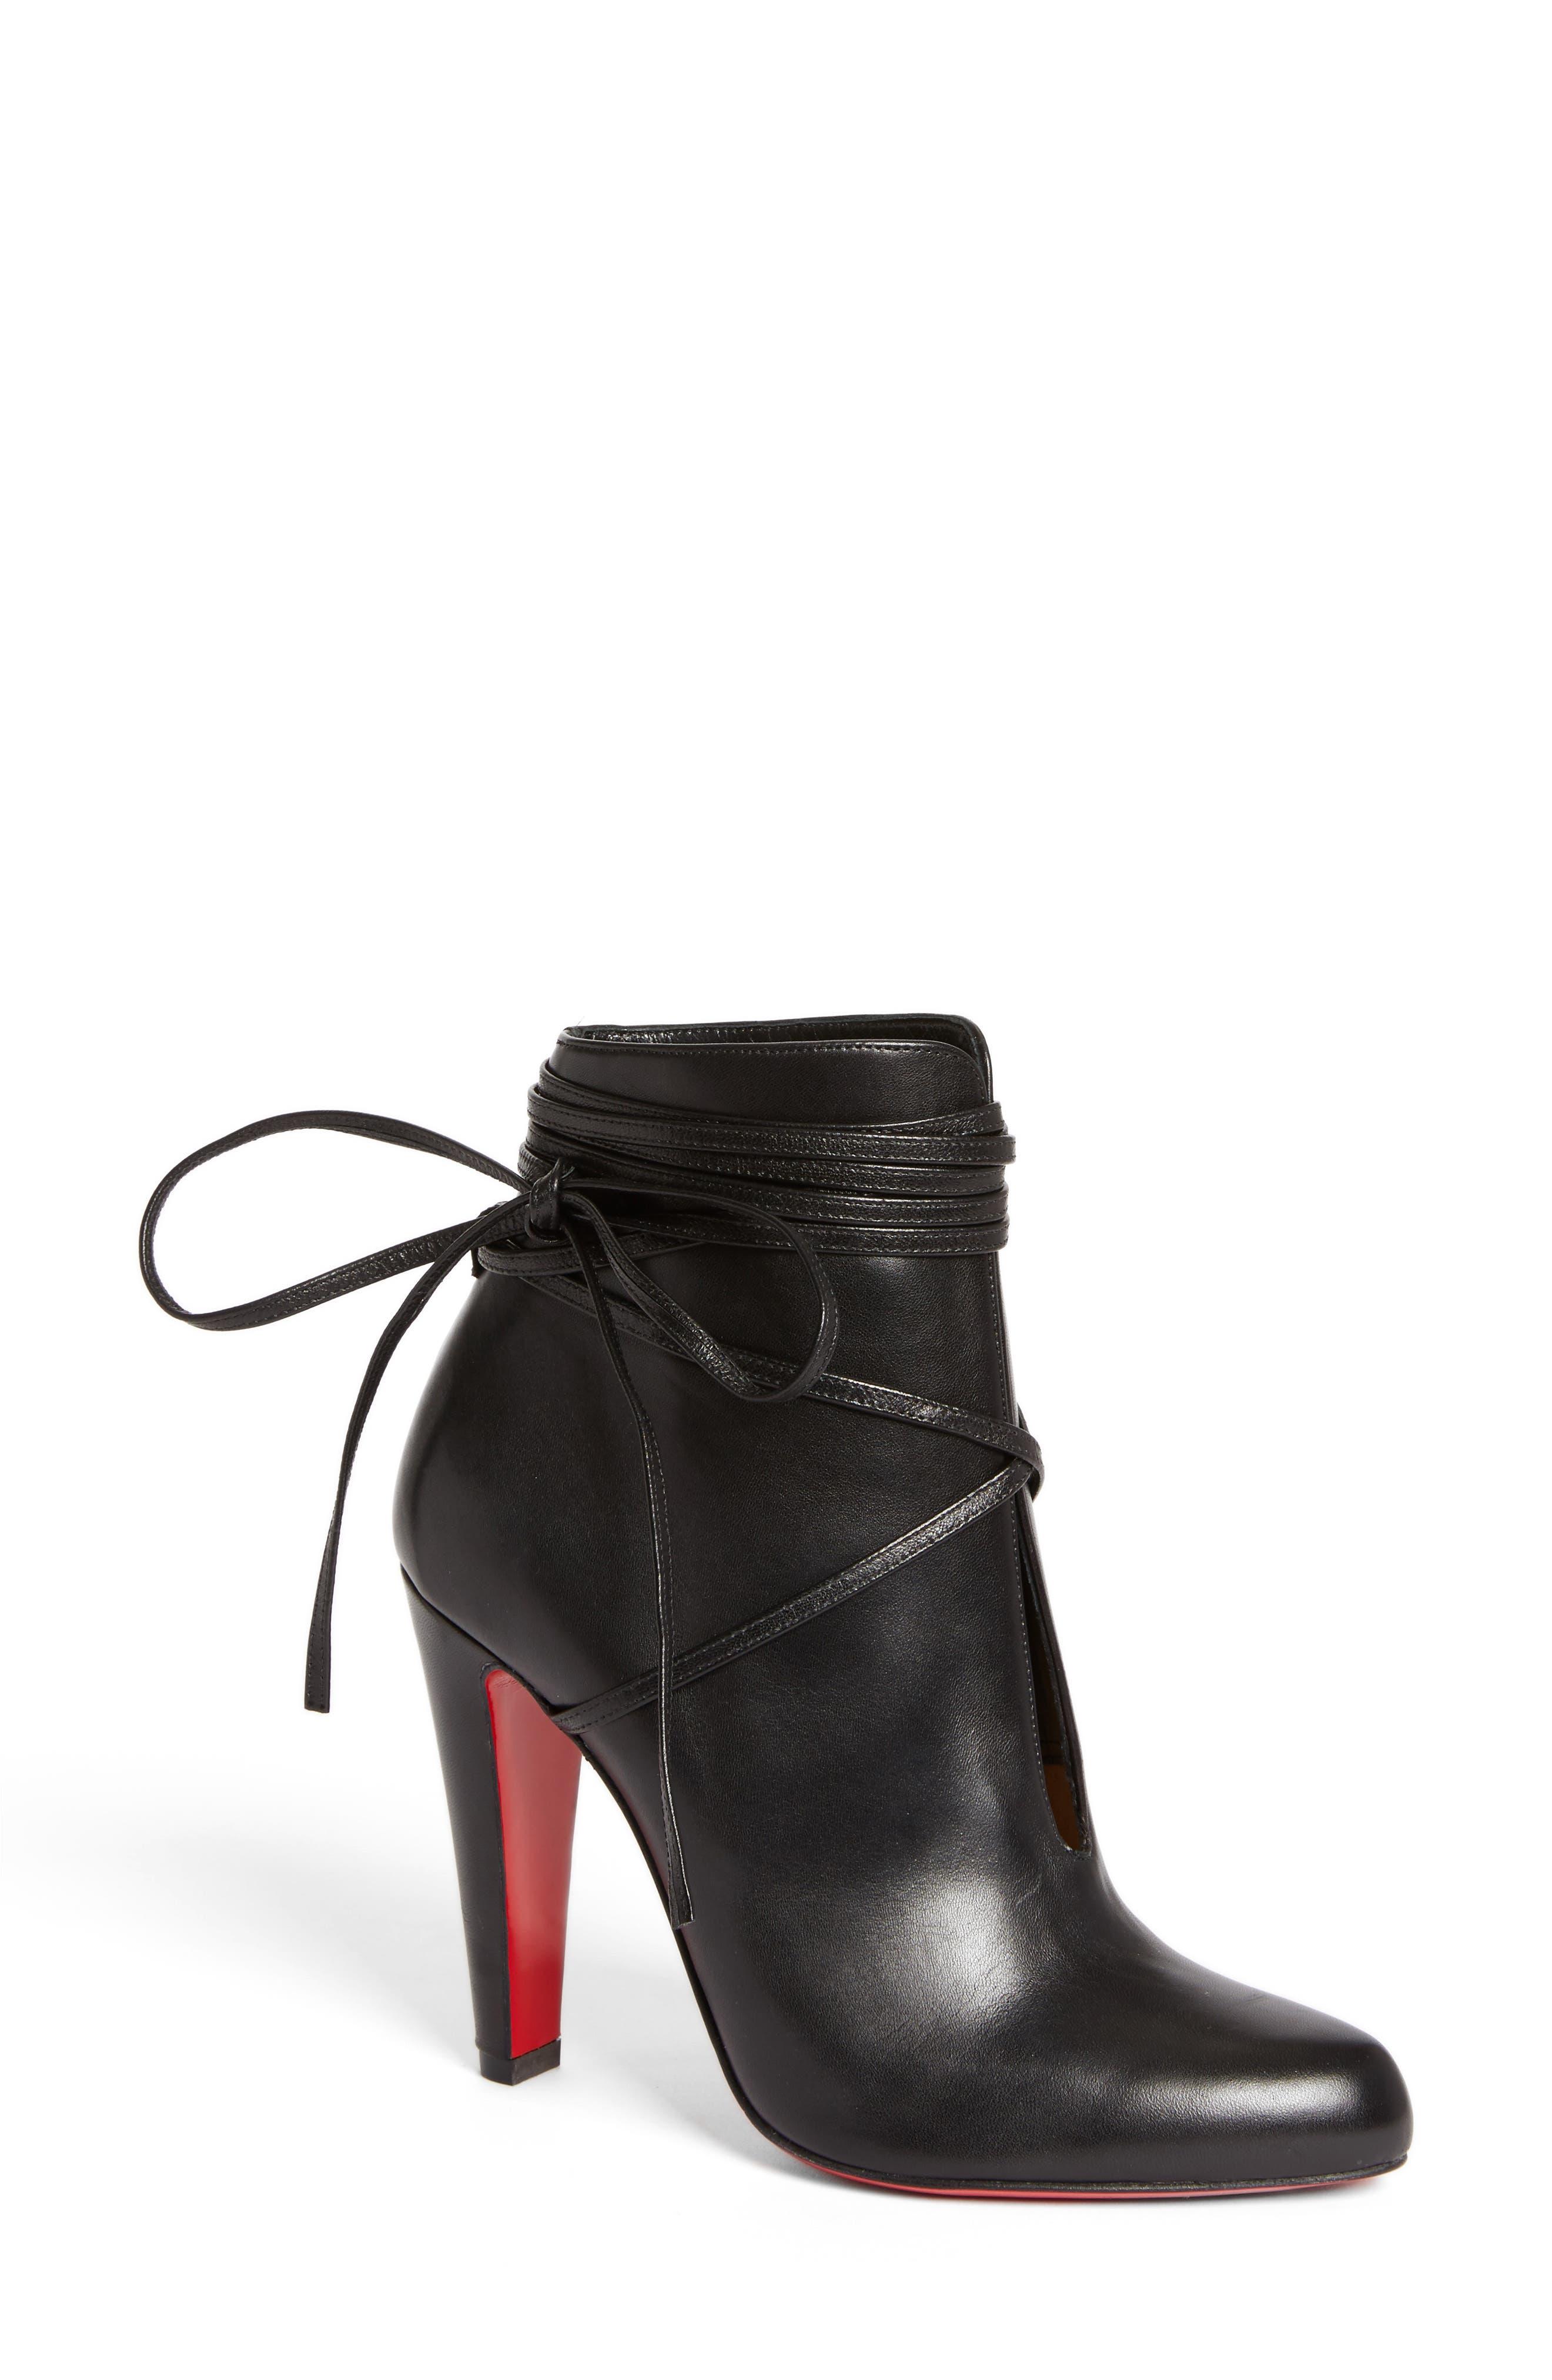 Ankle Tie Bootie,                             Main thumbnail 1, color,                             Black Leather